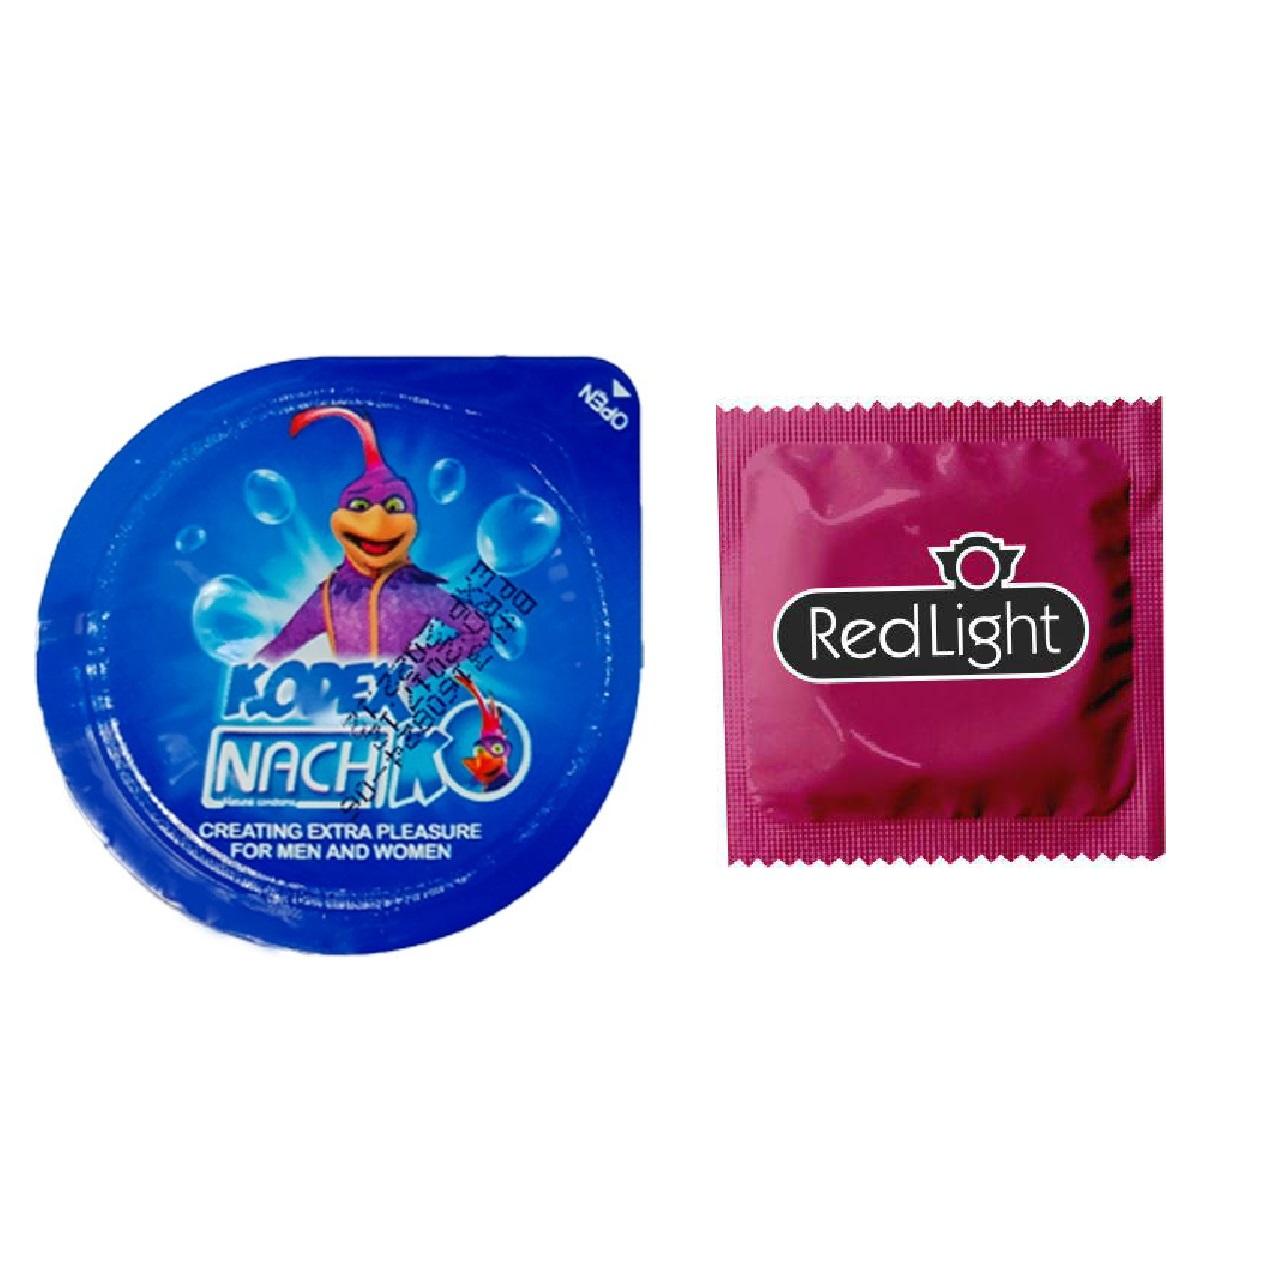 کاندوم ناچ مدل بلیسر کدکس به همراه یک عدد کاندوم ردلایت مدل فویل